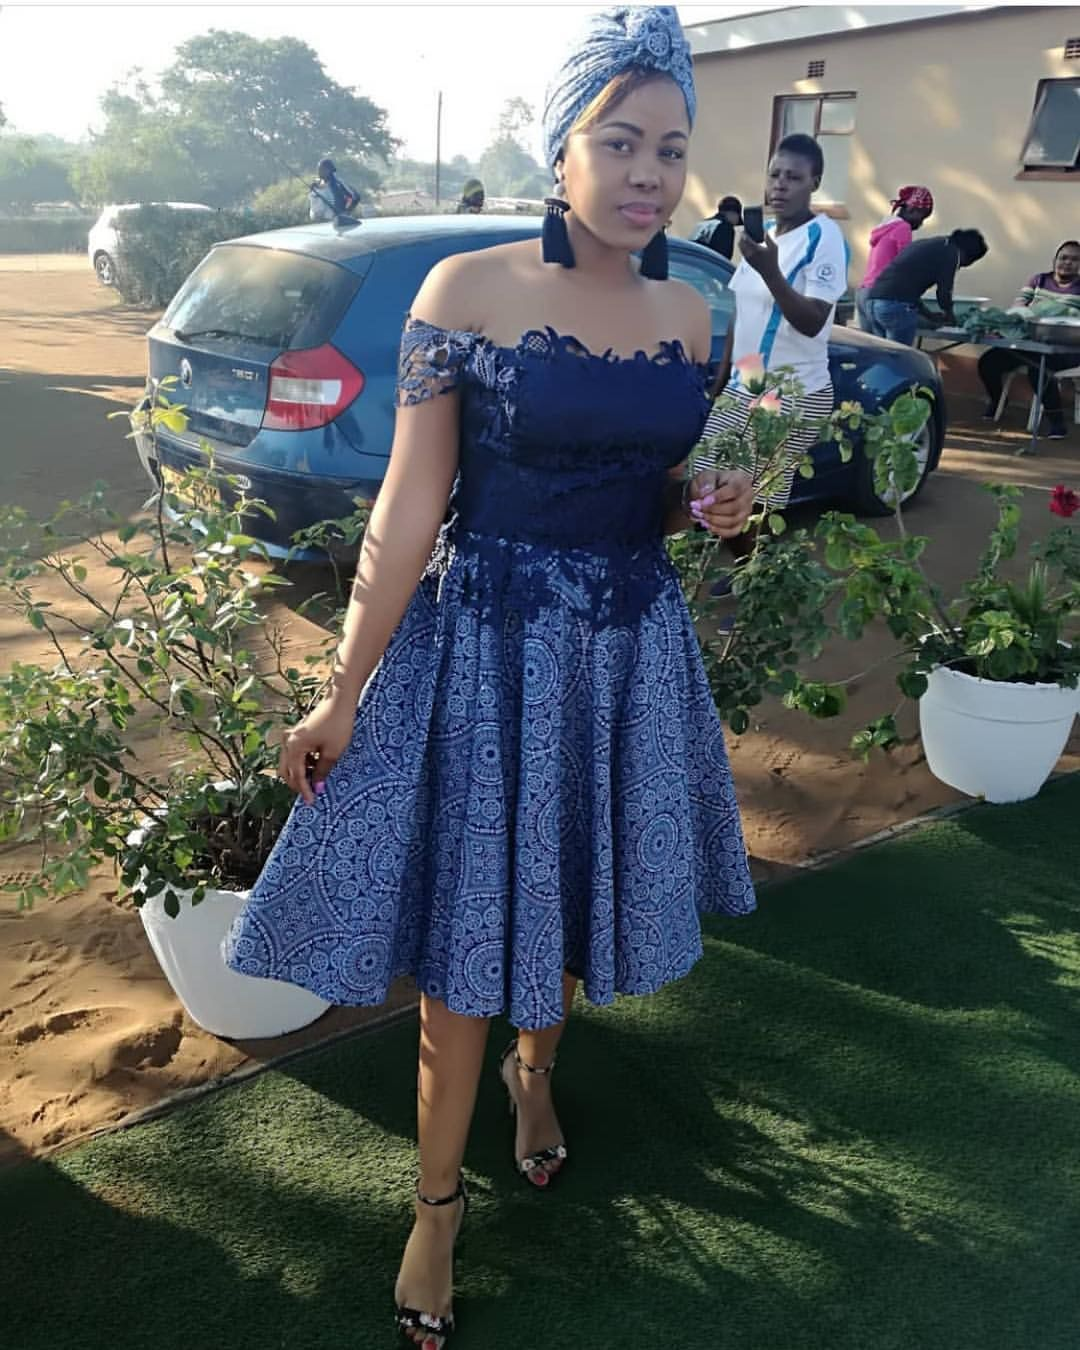 @att_izy #tswanafied #leteisi #seshweshwe #ankara